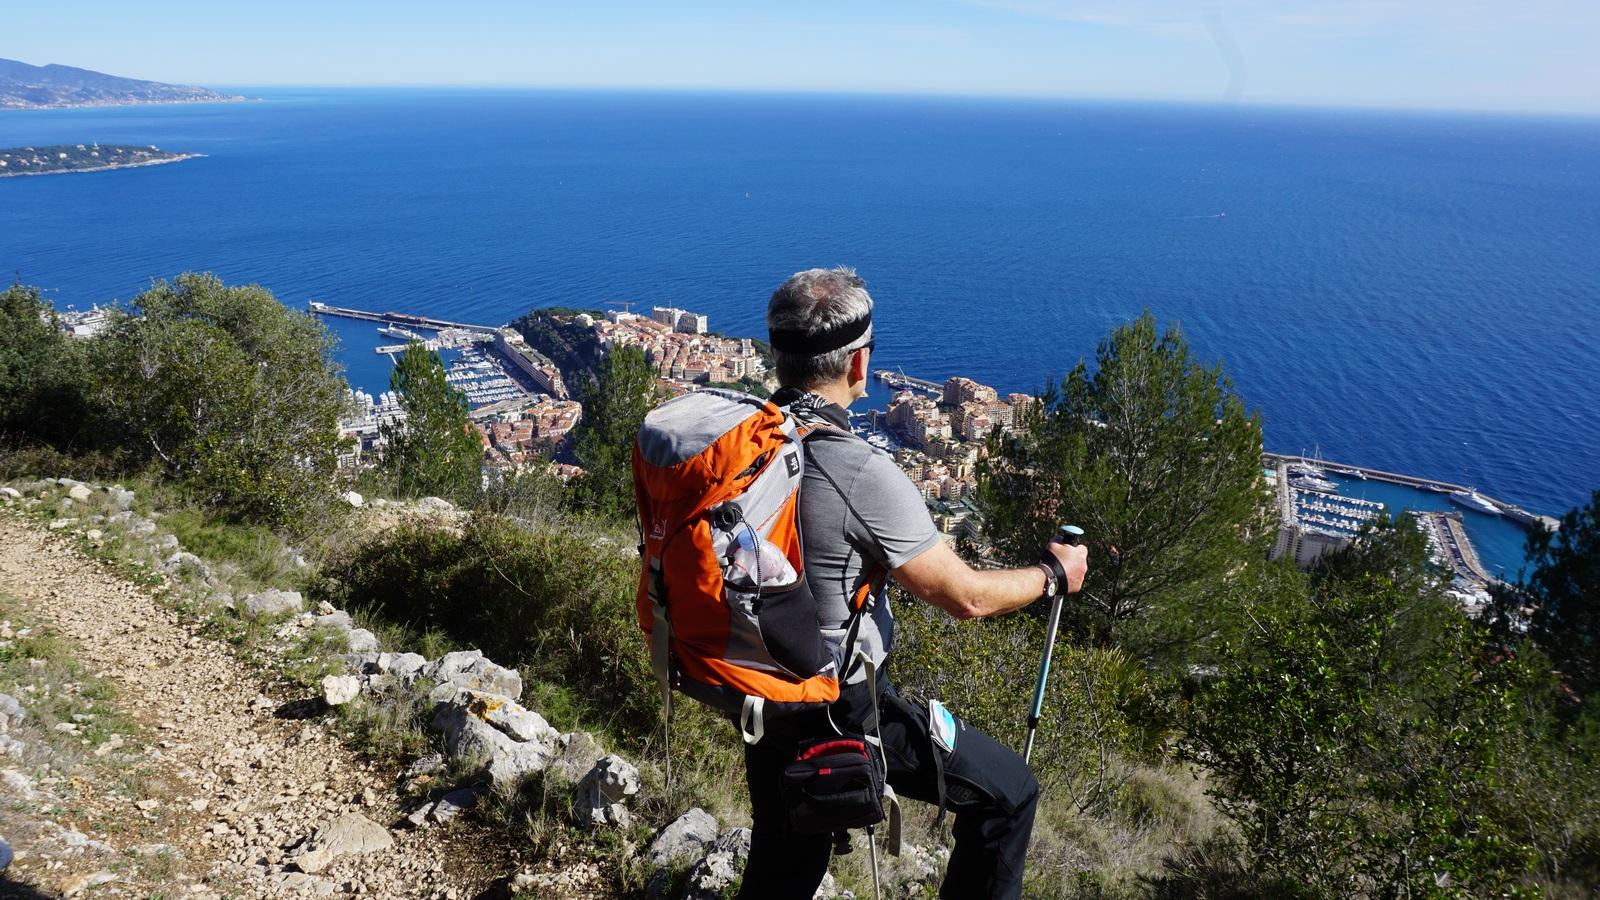 Admiring Monaco from the trail descending from Tete de Chien